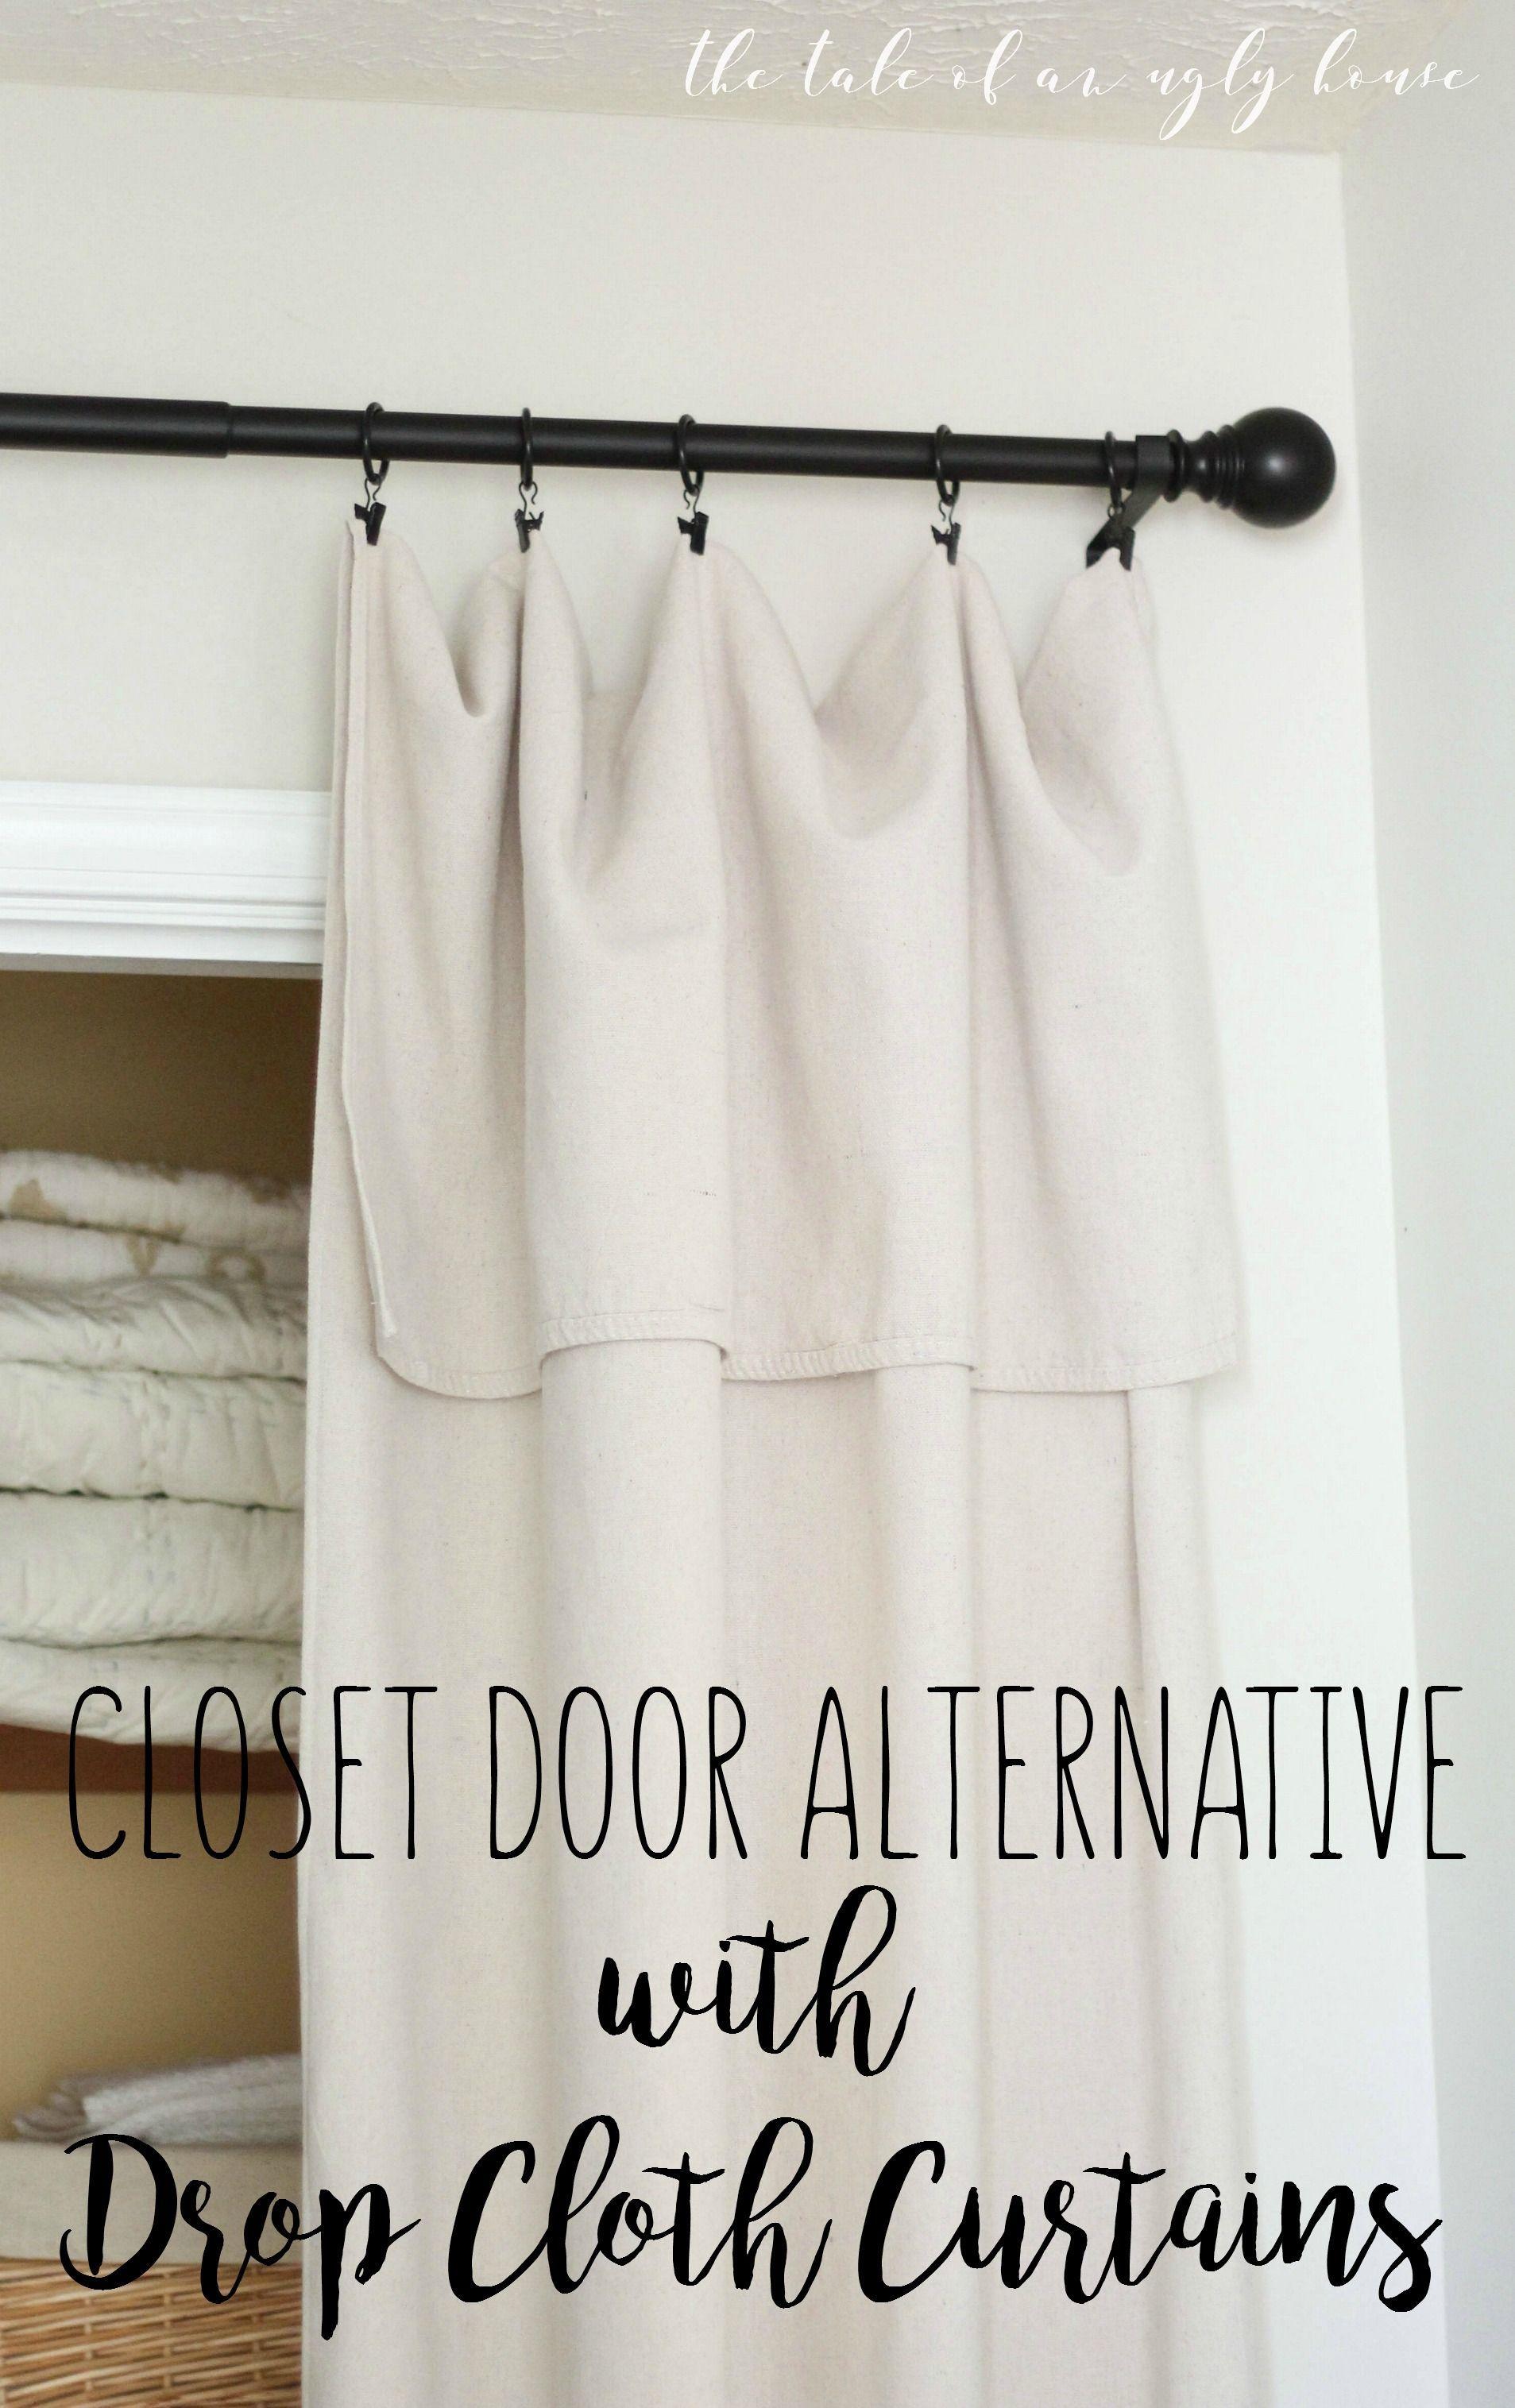 DIY closet door alternative with drop cloth curtains Easy and super